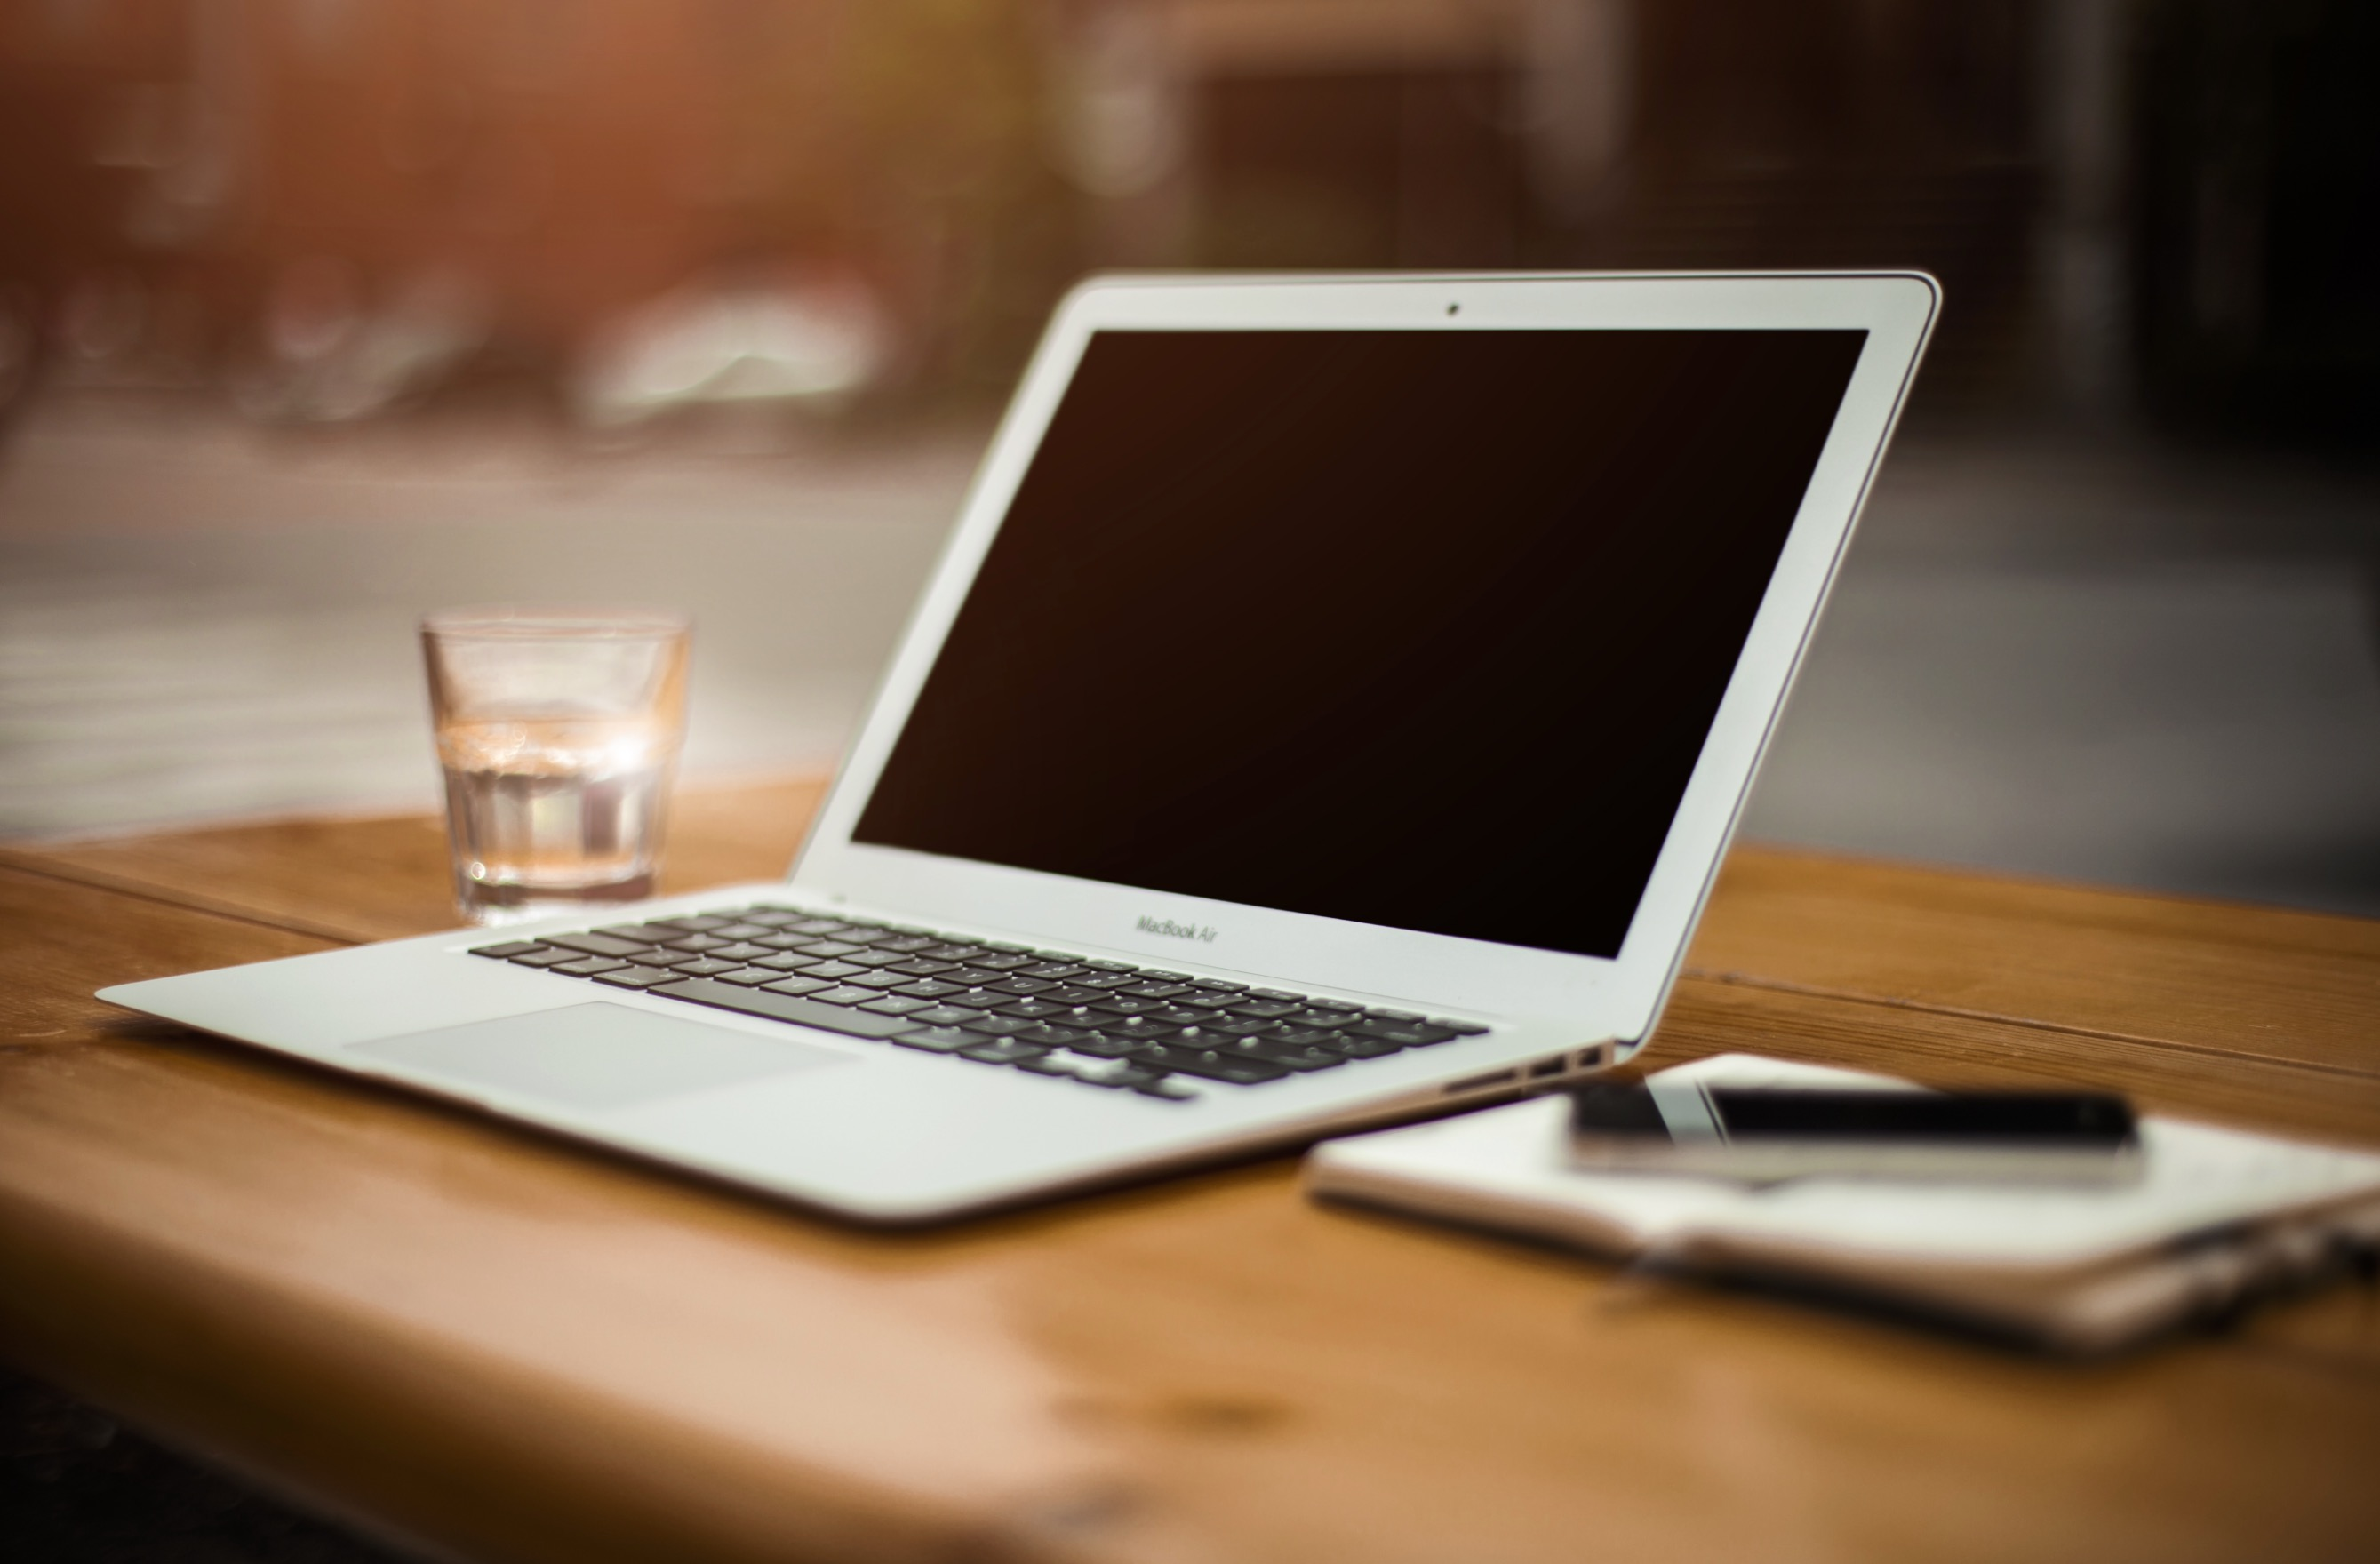 Catturare schermo Mac OS X e macOS